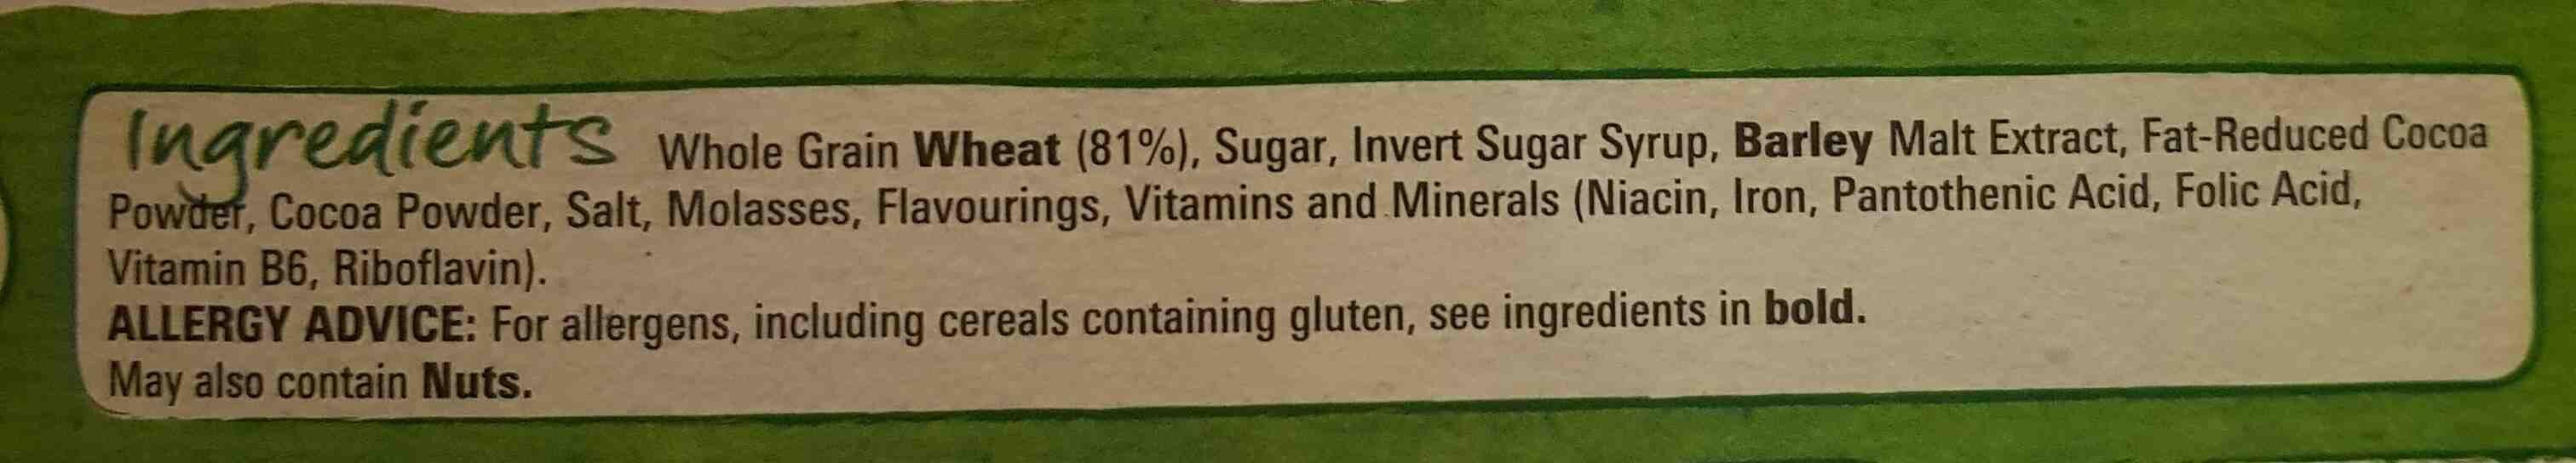 coco caramel Shreddies - Ingredients